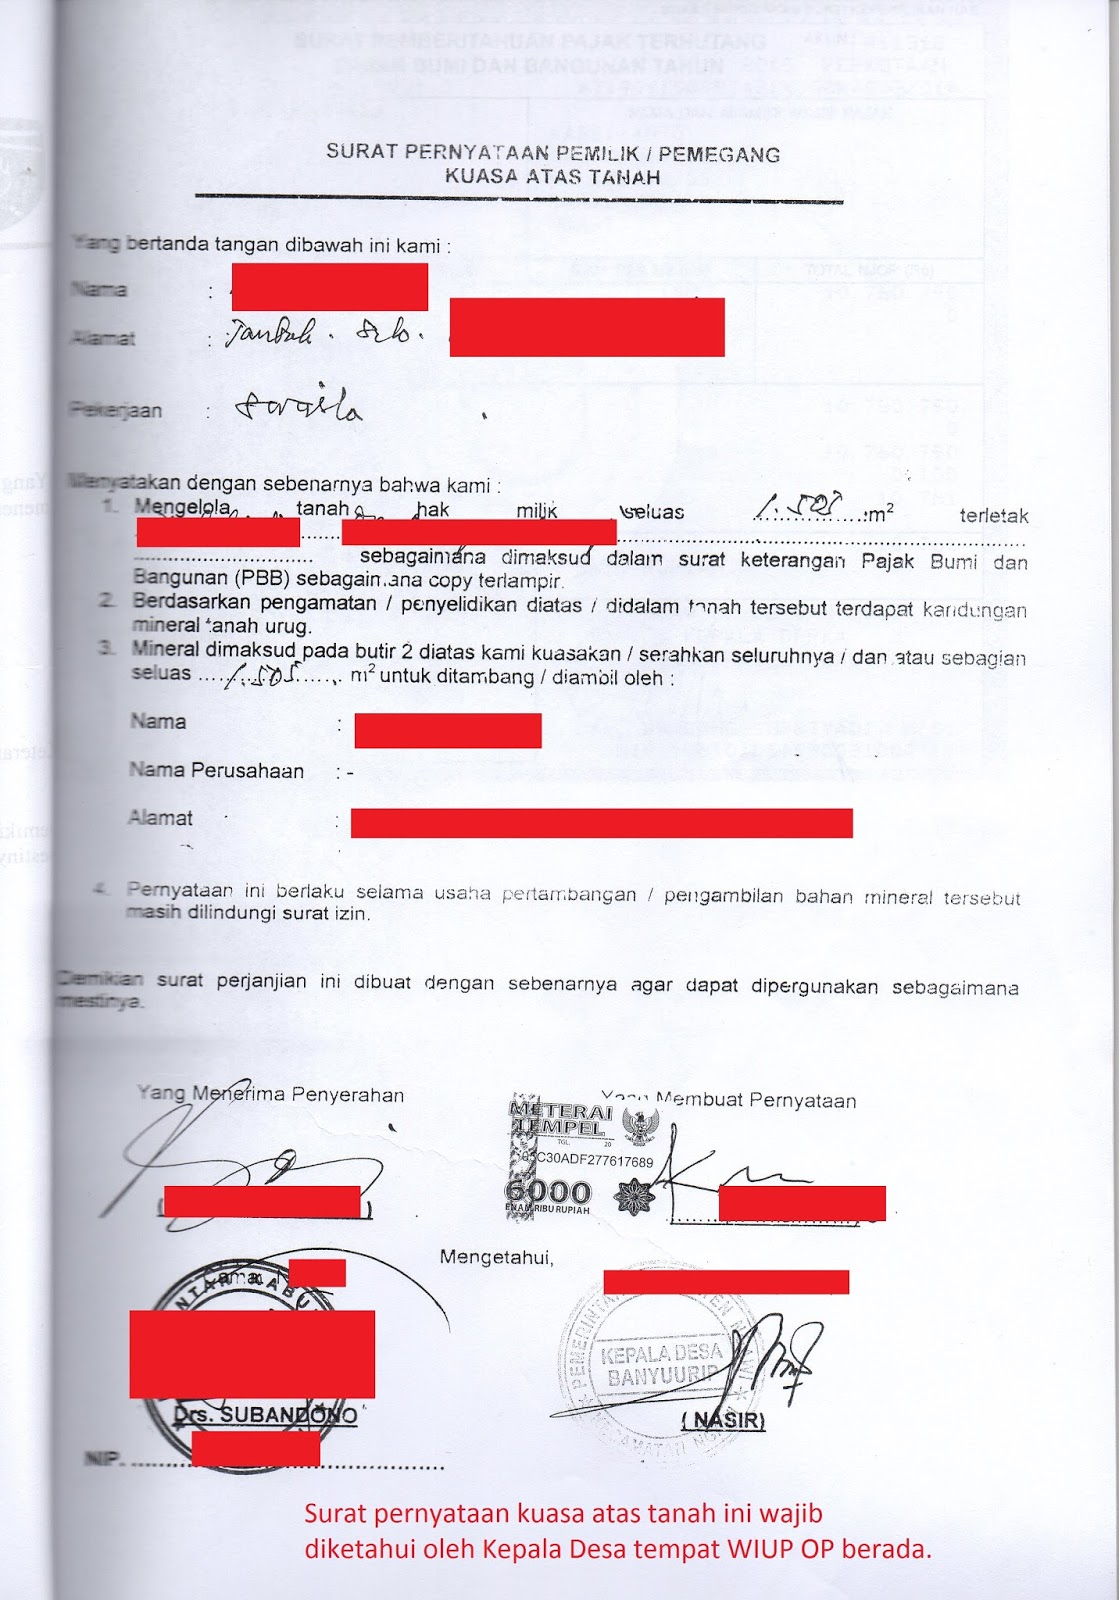 contoh surat izin kunjungan ke rumah sakit   sportschuhe